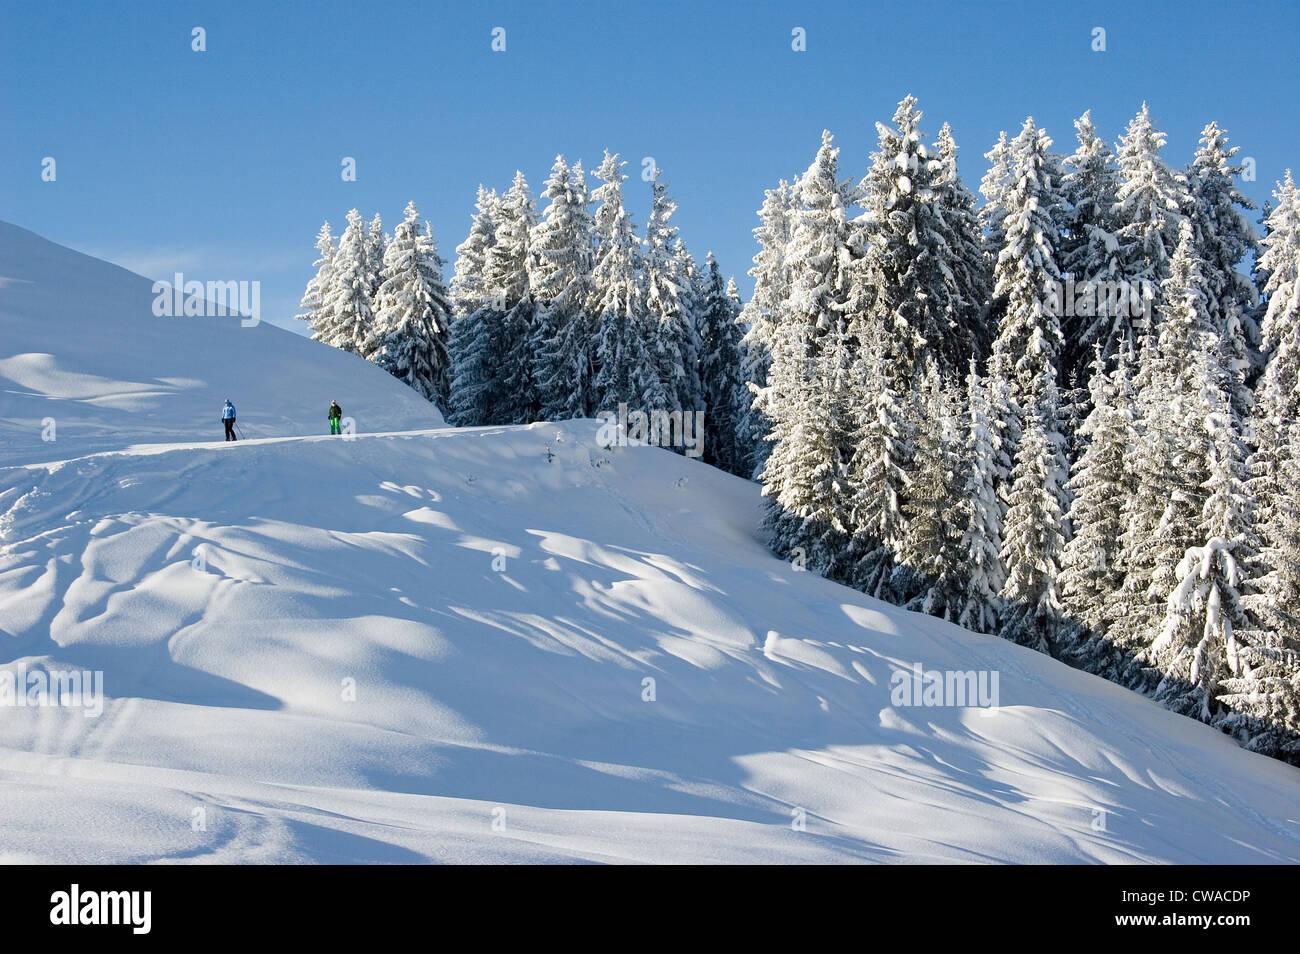 Niederau, skiers on a ski slope - Stock Image